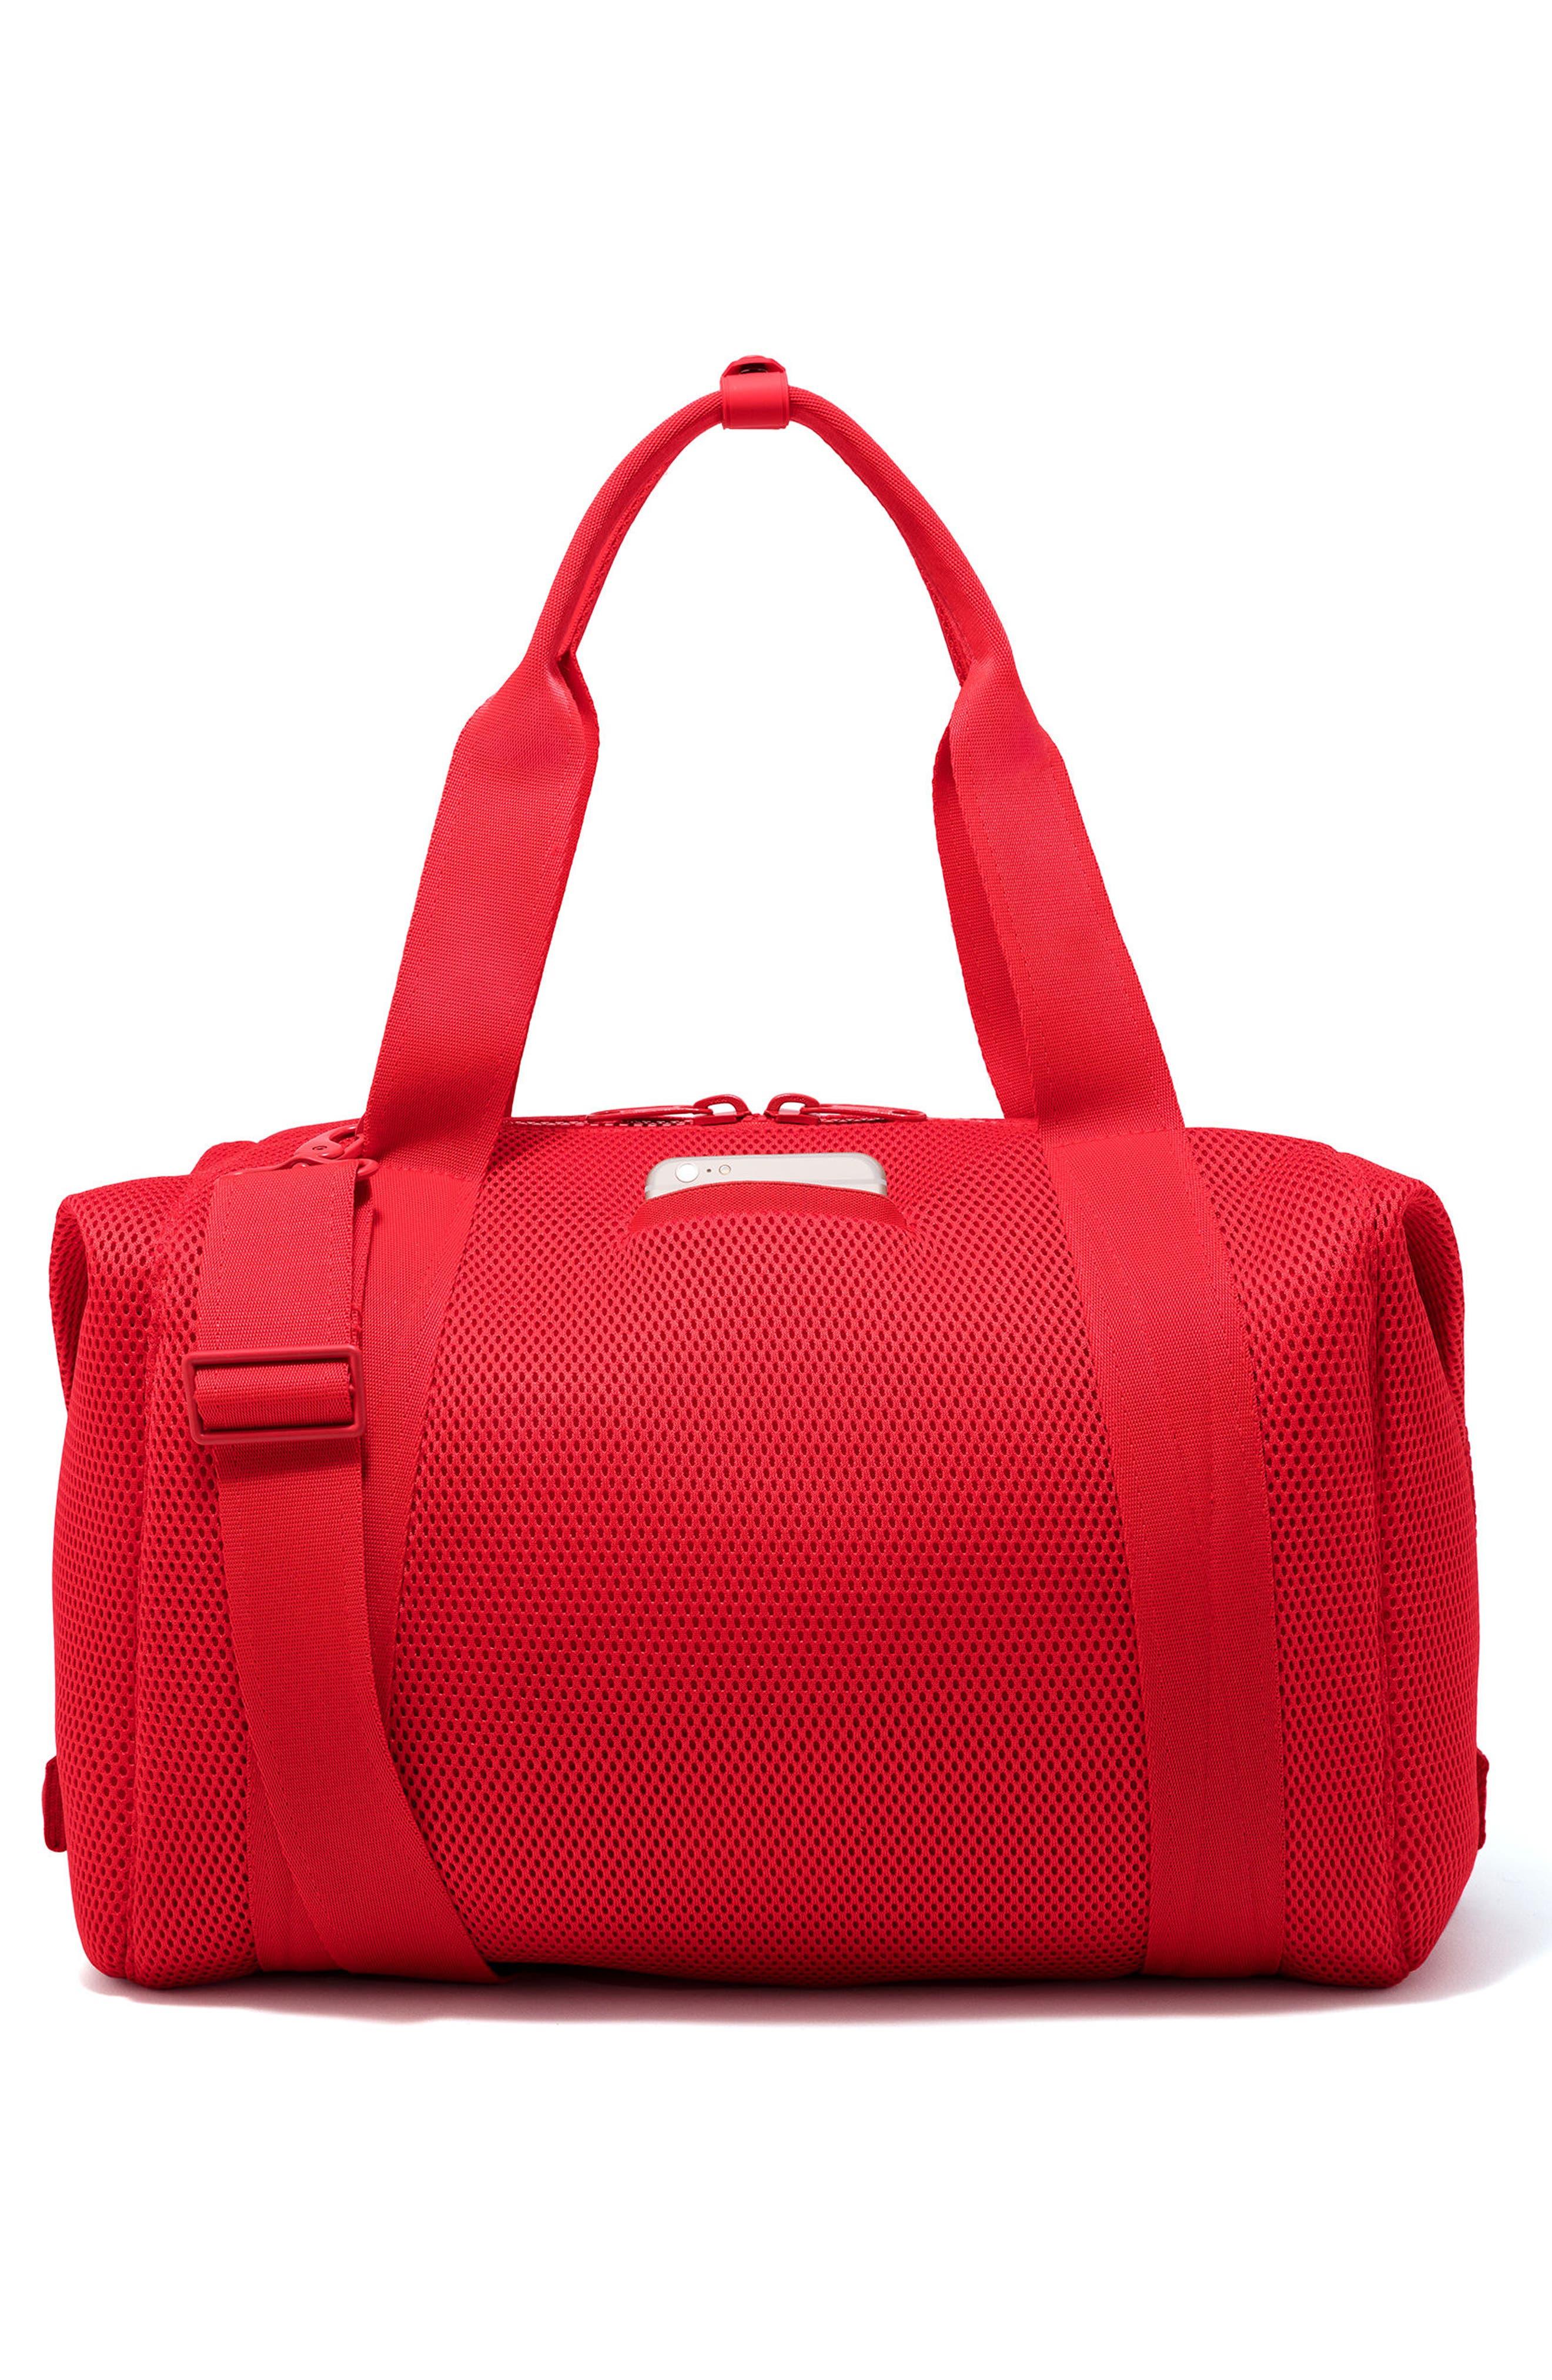 365 Large Landon Neoprene Carryall Duffel Bag,                             Alternate thumbnail 35, color,